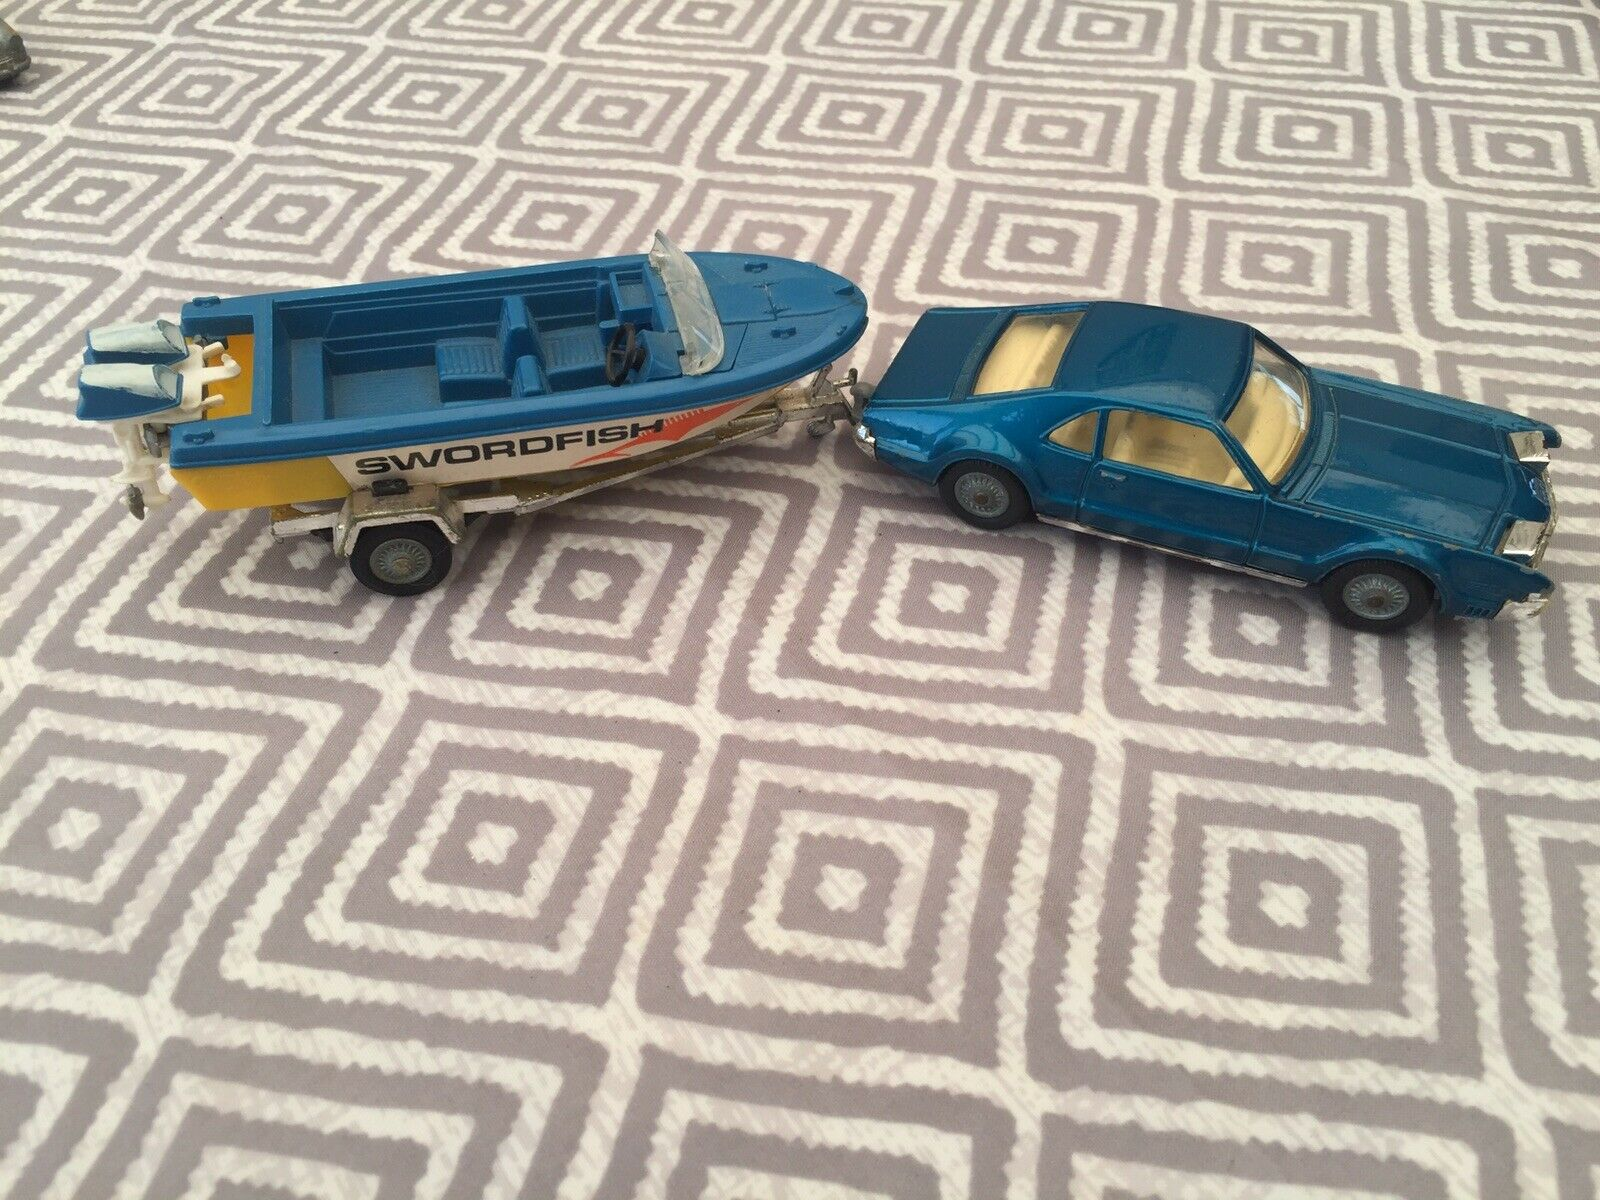 Vintage 1960 s Corgi Toys GS36 Oldsmobile Tornado & glastron Sportsman soeedboat